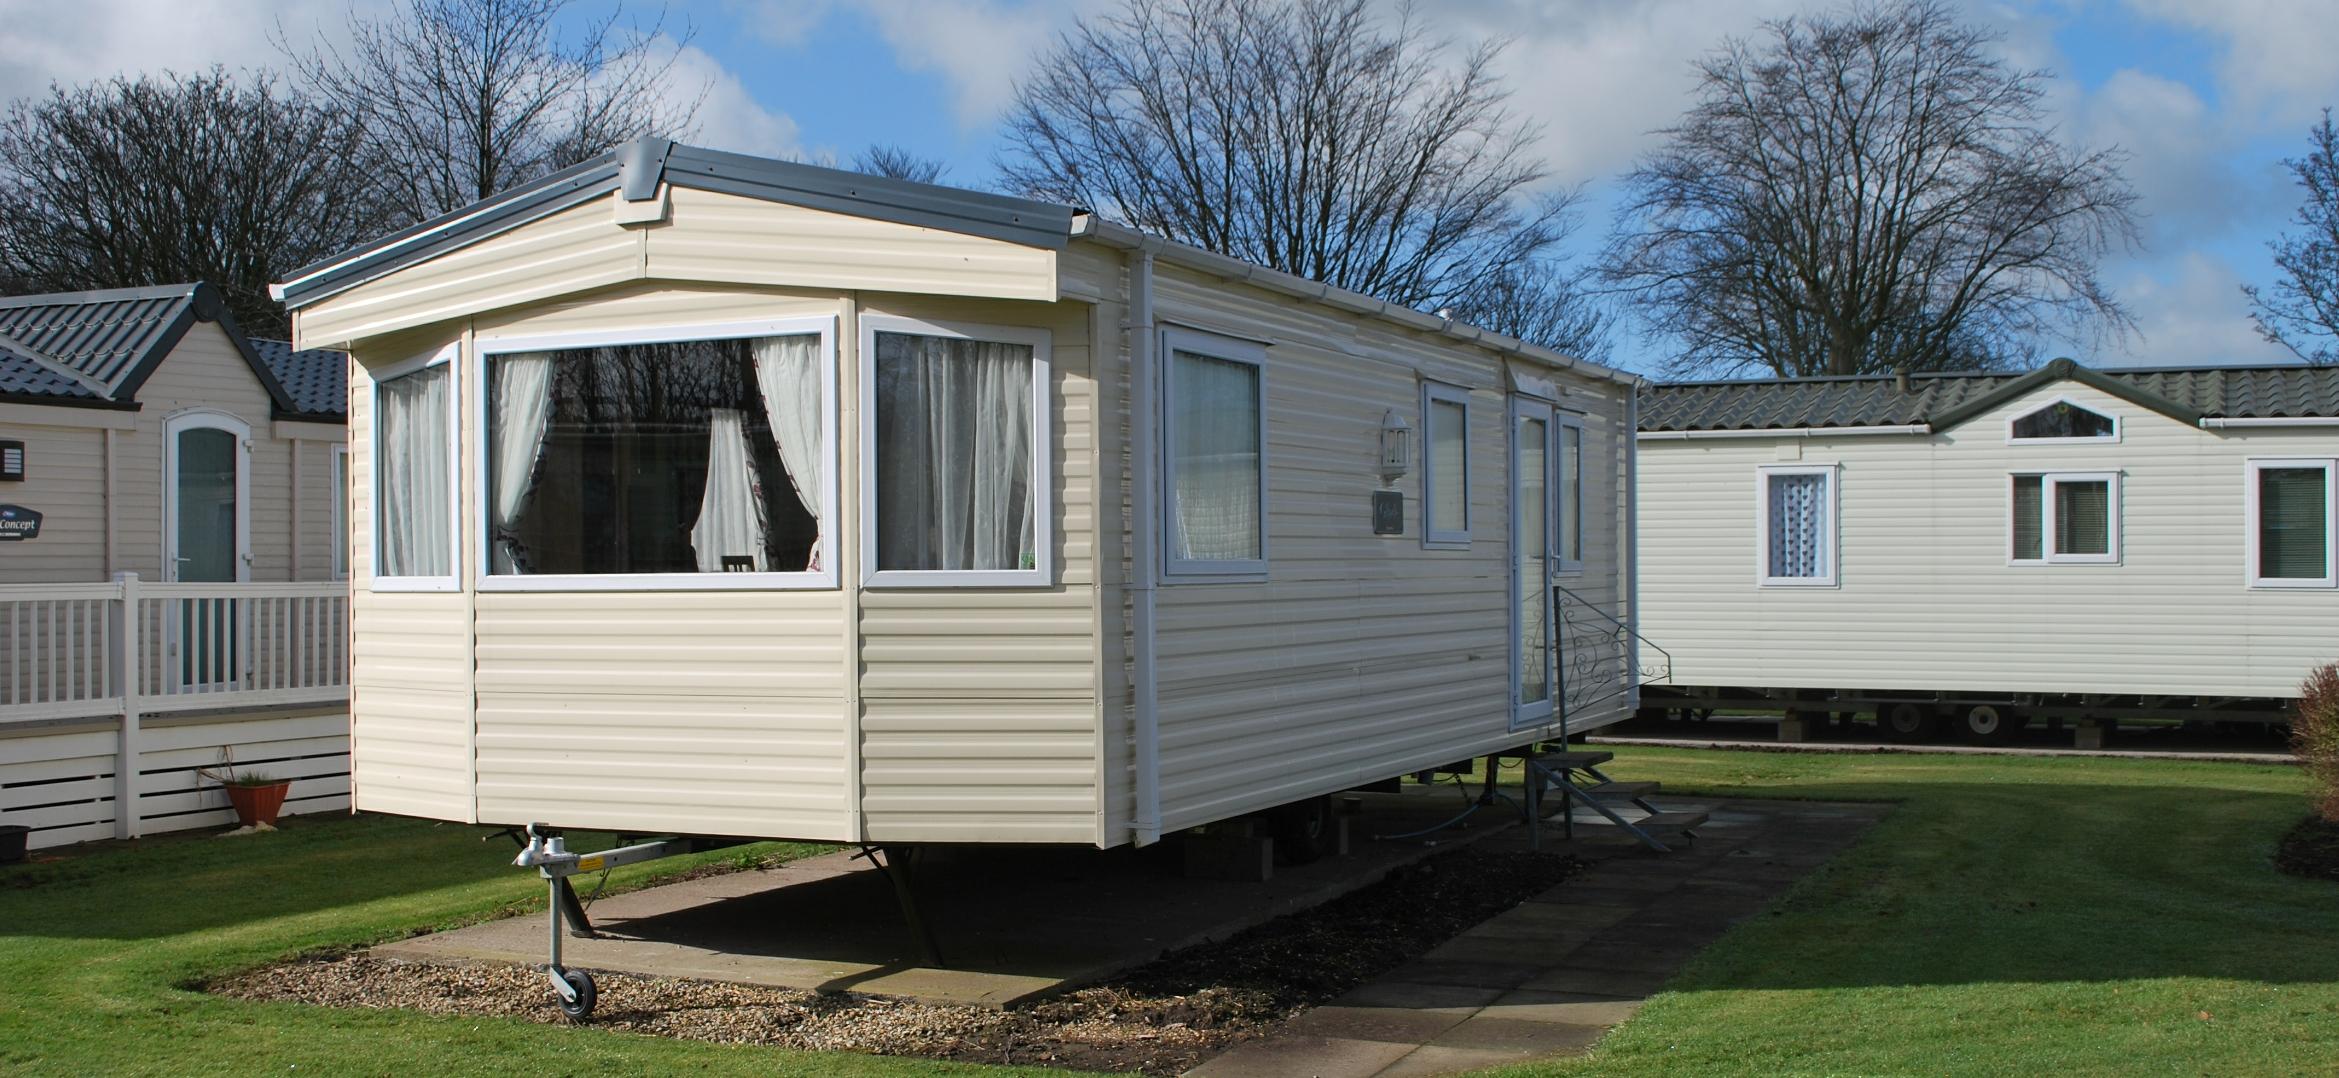 caravan holidays at moss wood caravan park cockerham